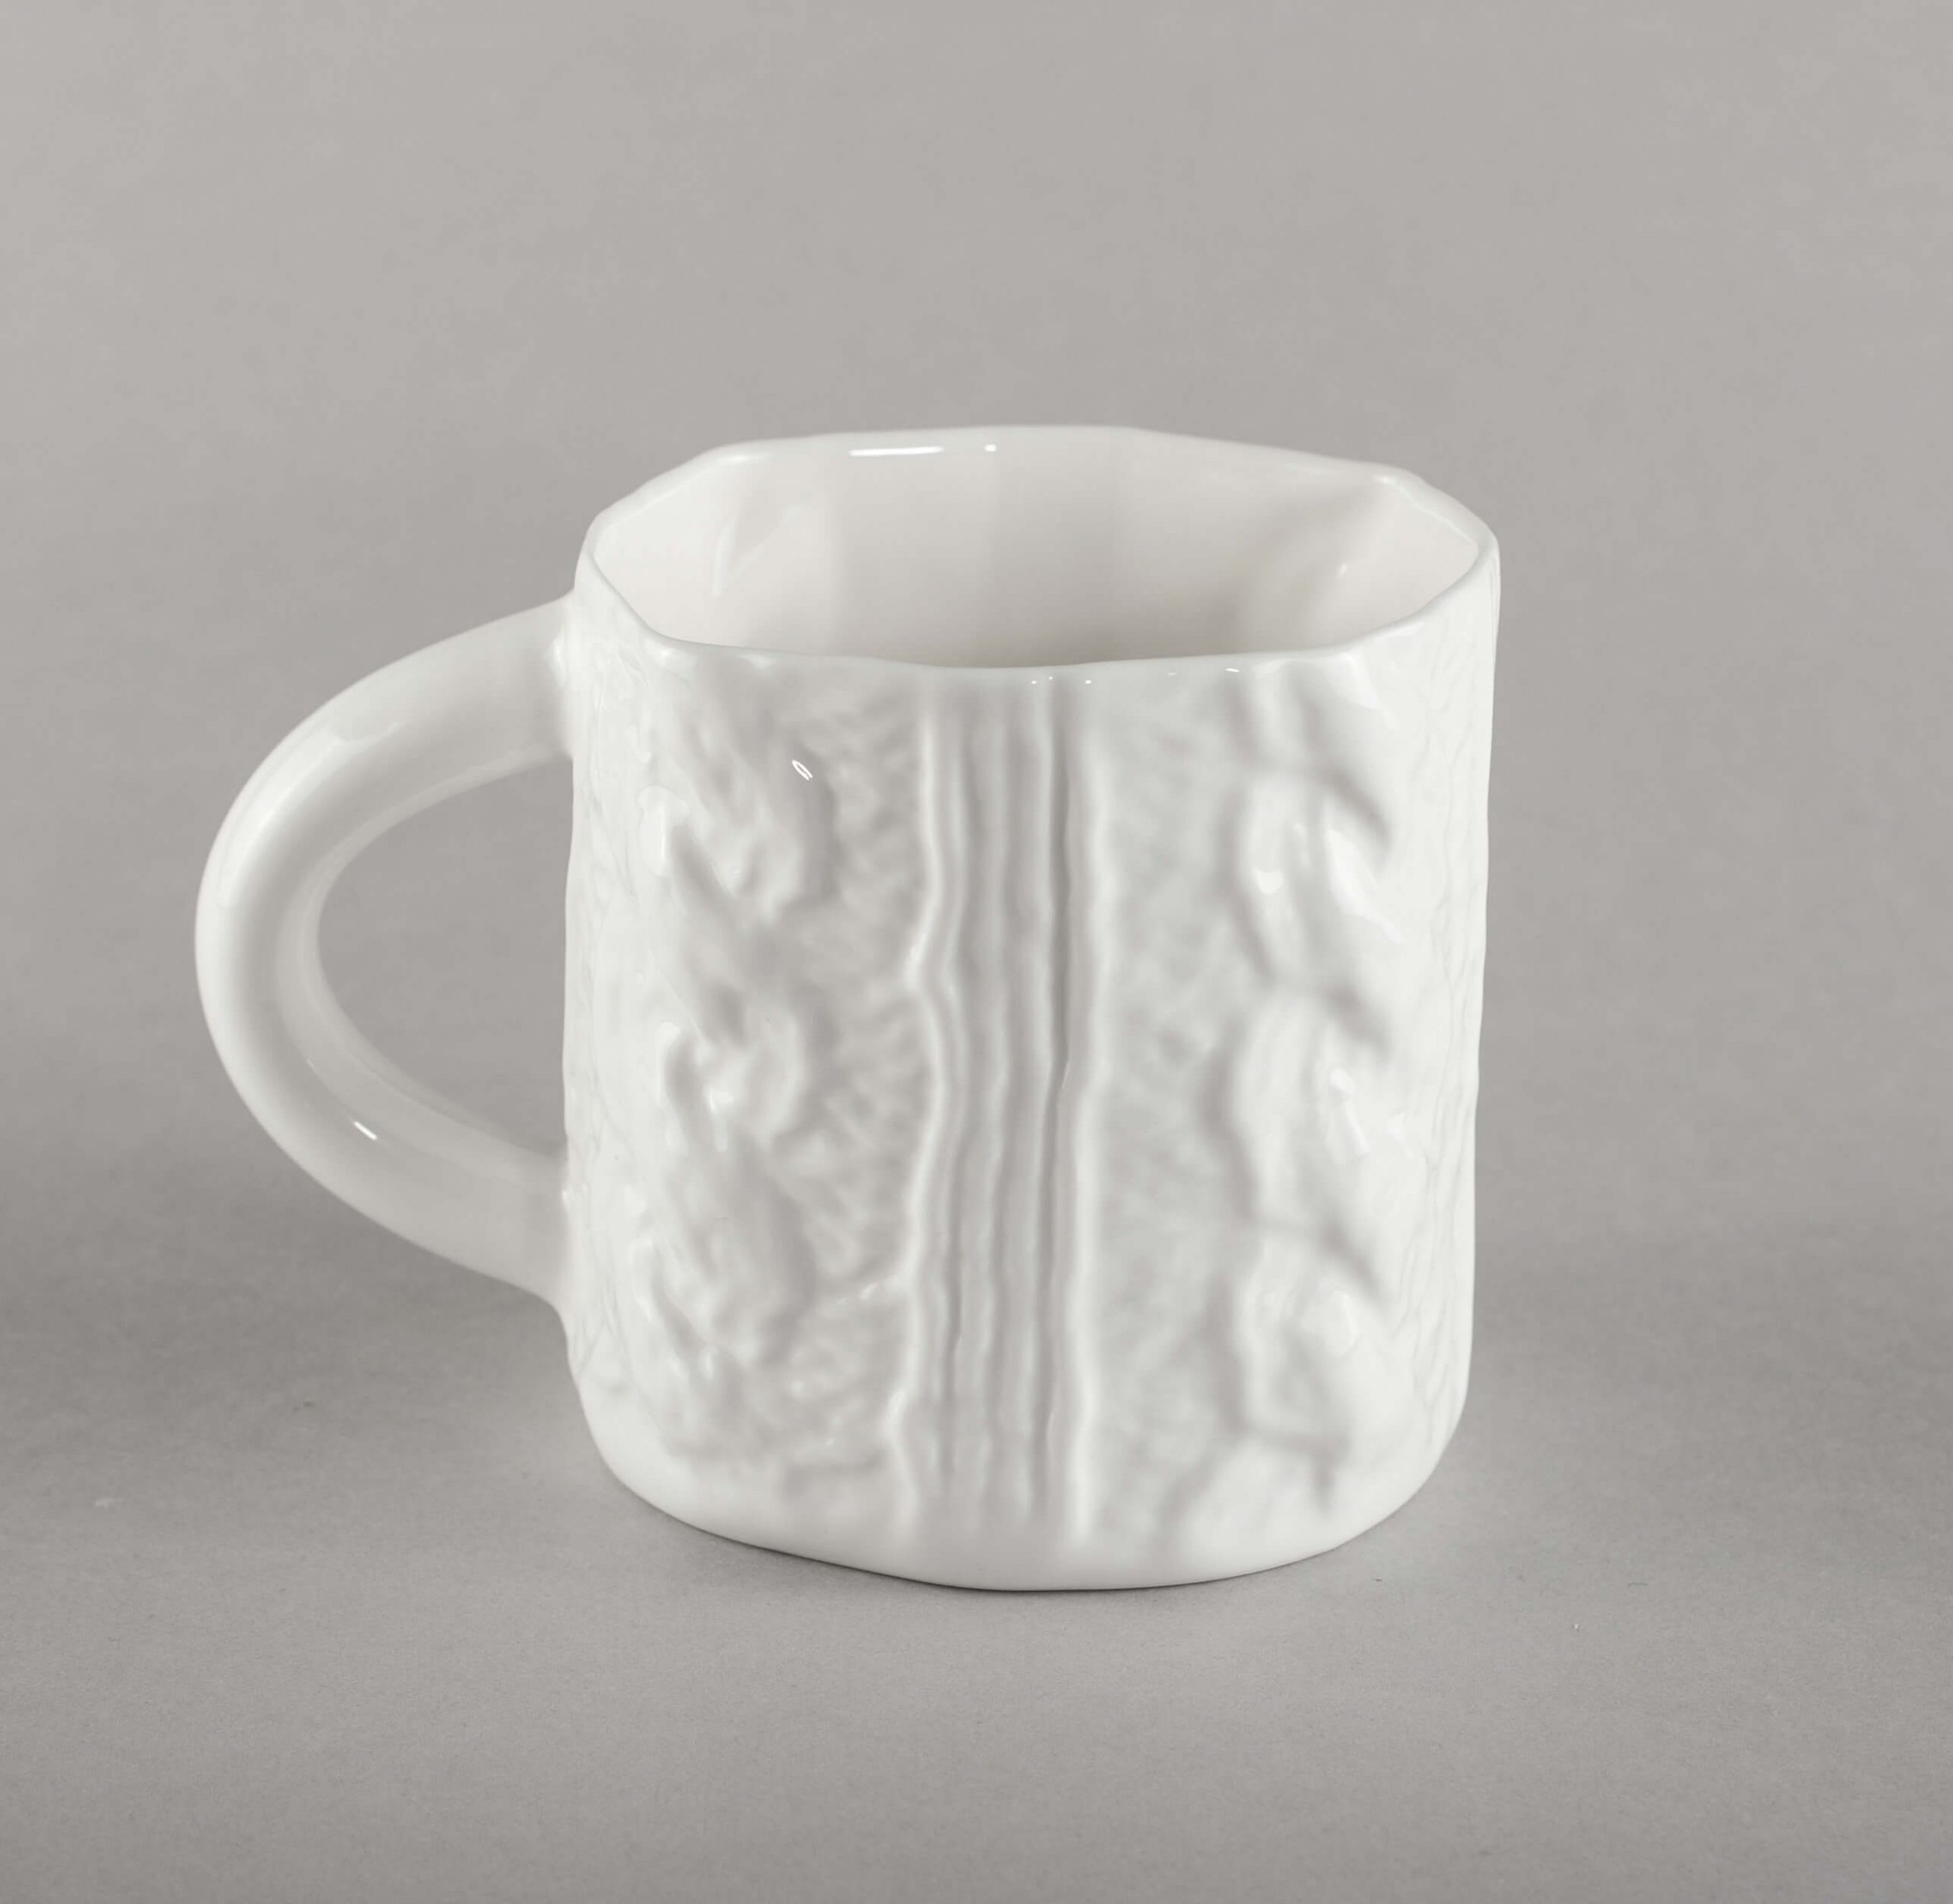 Piebalgas porcelain baltic design 8 scaled Piebalga Porcelain